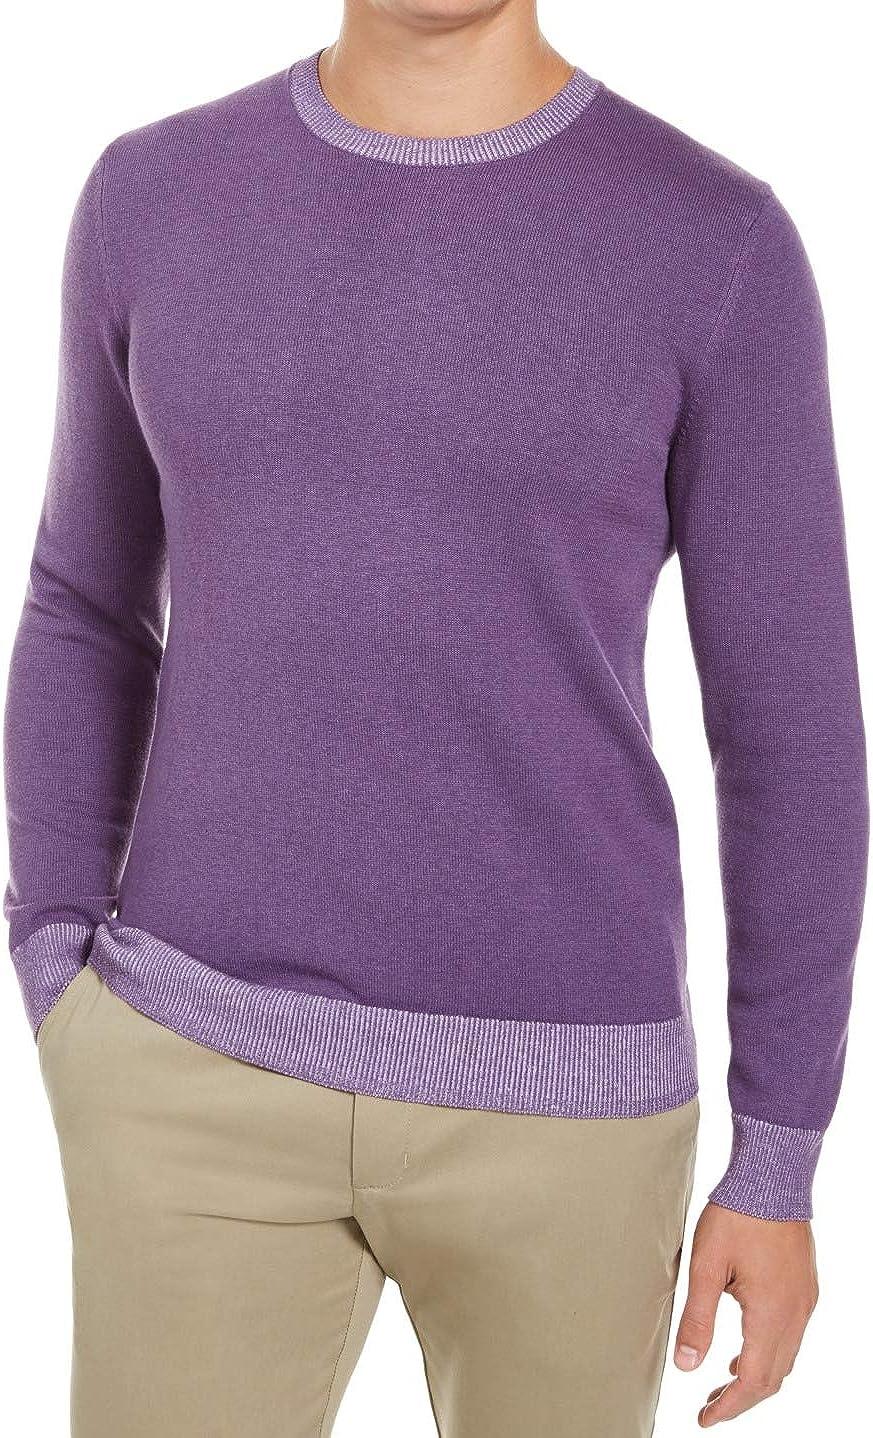 Tasso Elba Mens Sweater Crewneck Pullover Long-Sleeve Purple 2XL